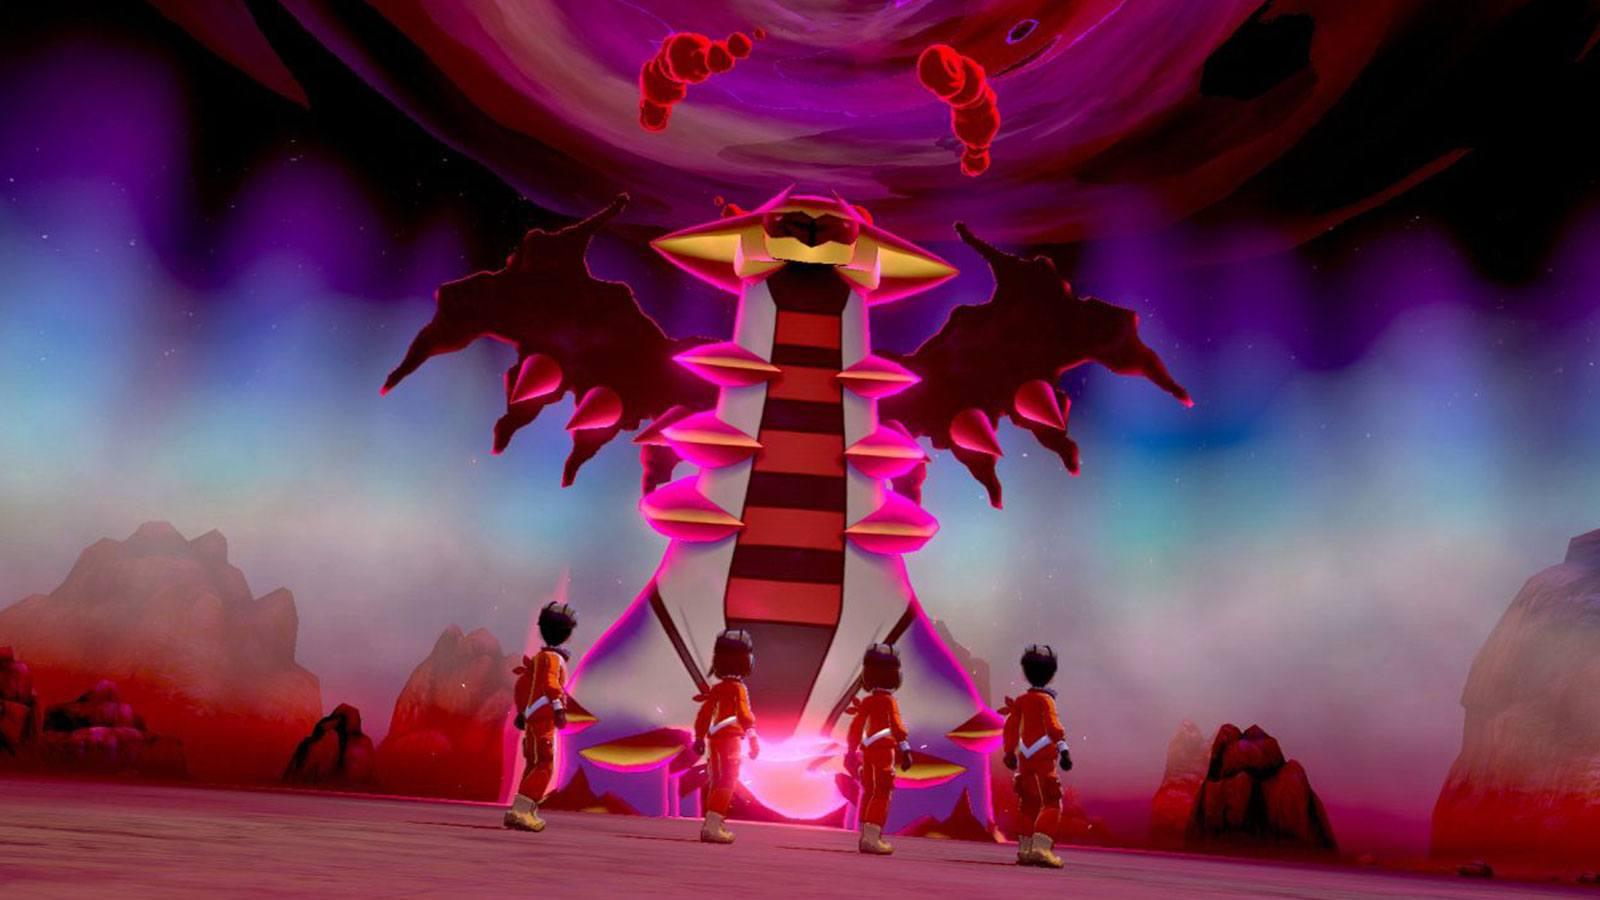 Pokémon Giratina expédition dynamax épée bouclier crown toundra